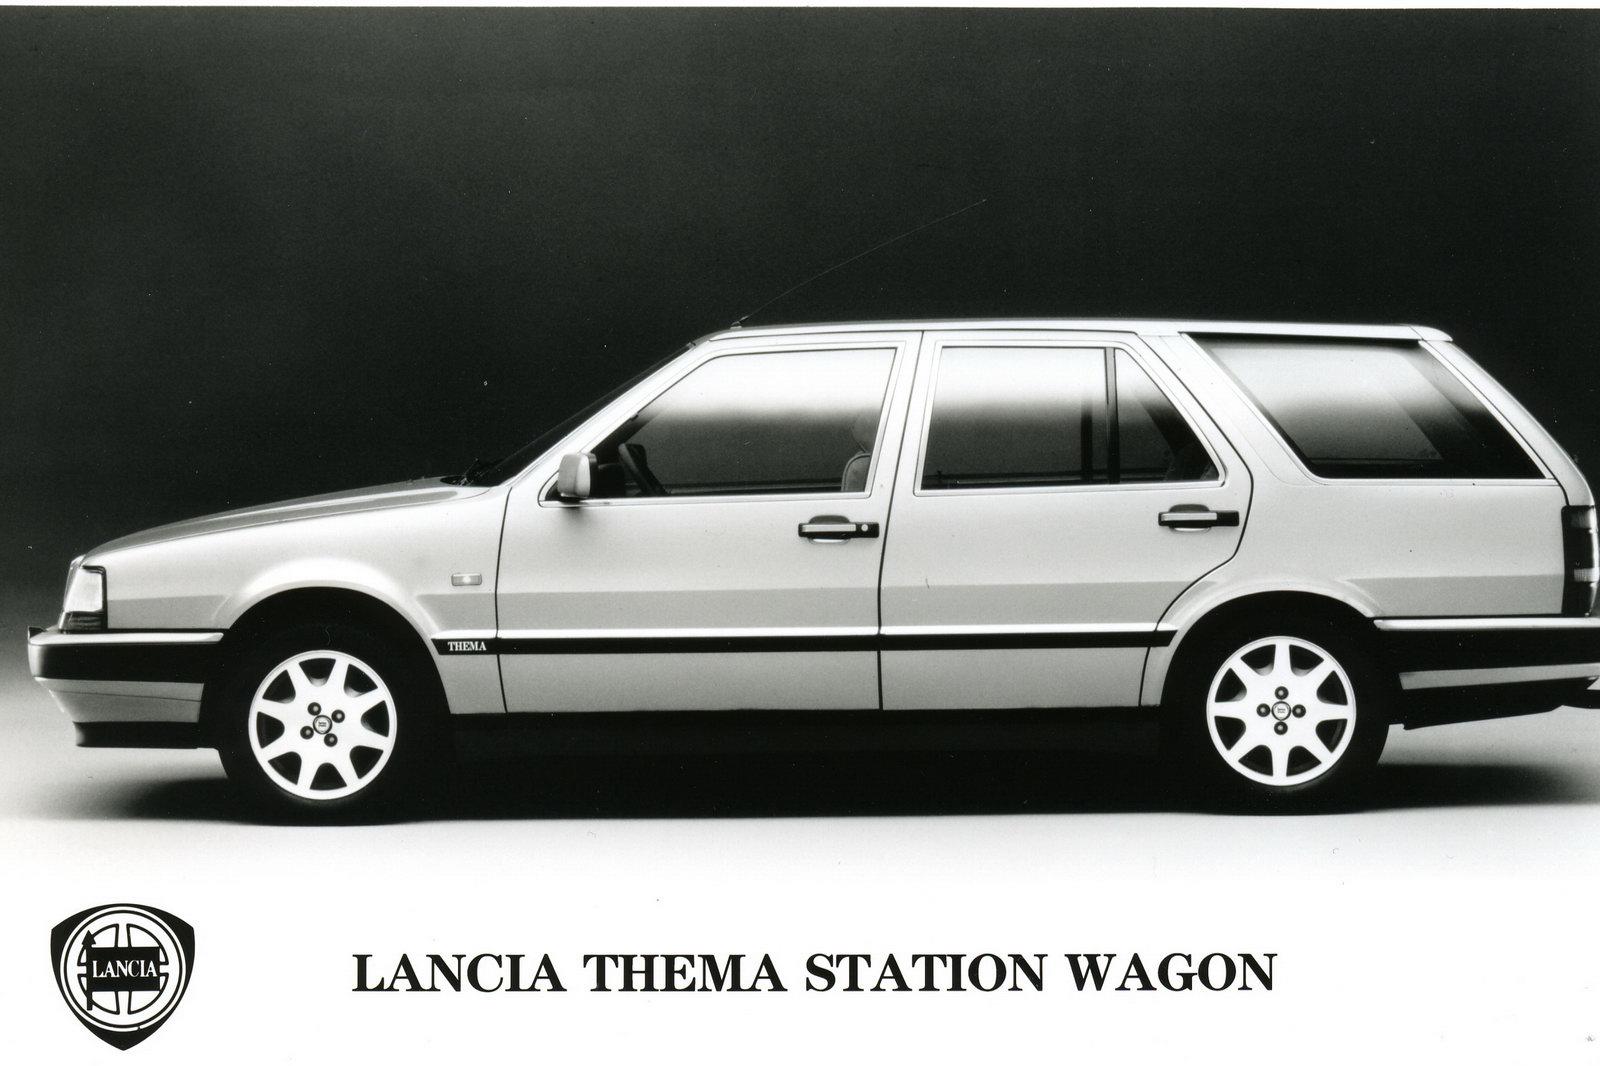 http://carsot.com/images/lancia-thema-i-1984-1994-station-wagon-5-door-exterior.jpg